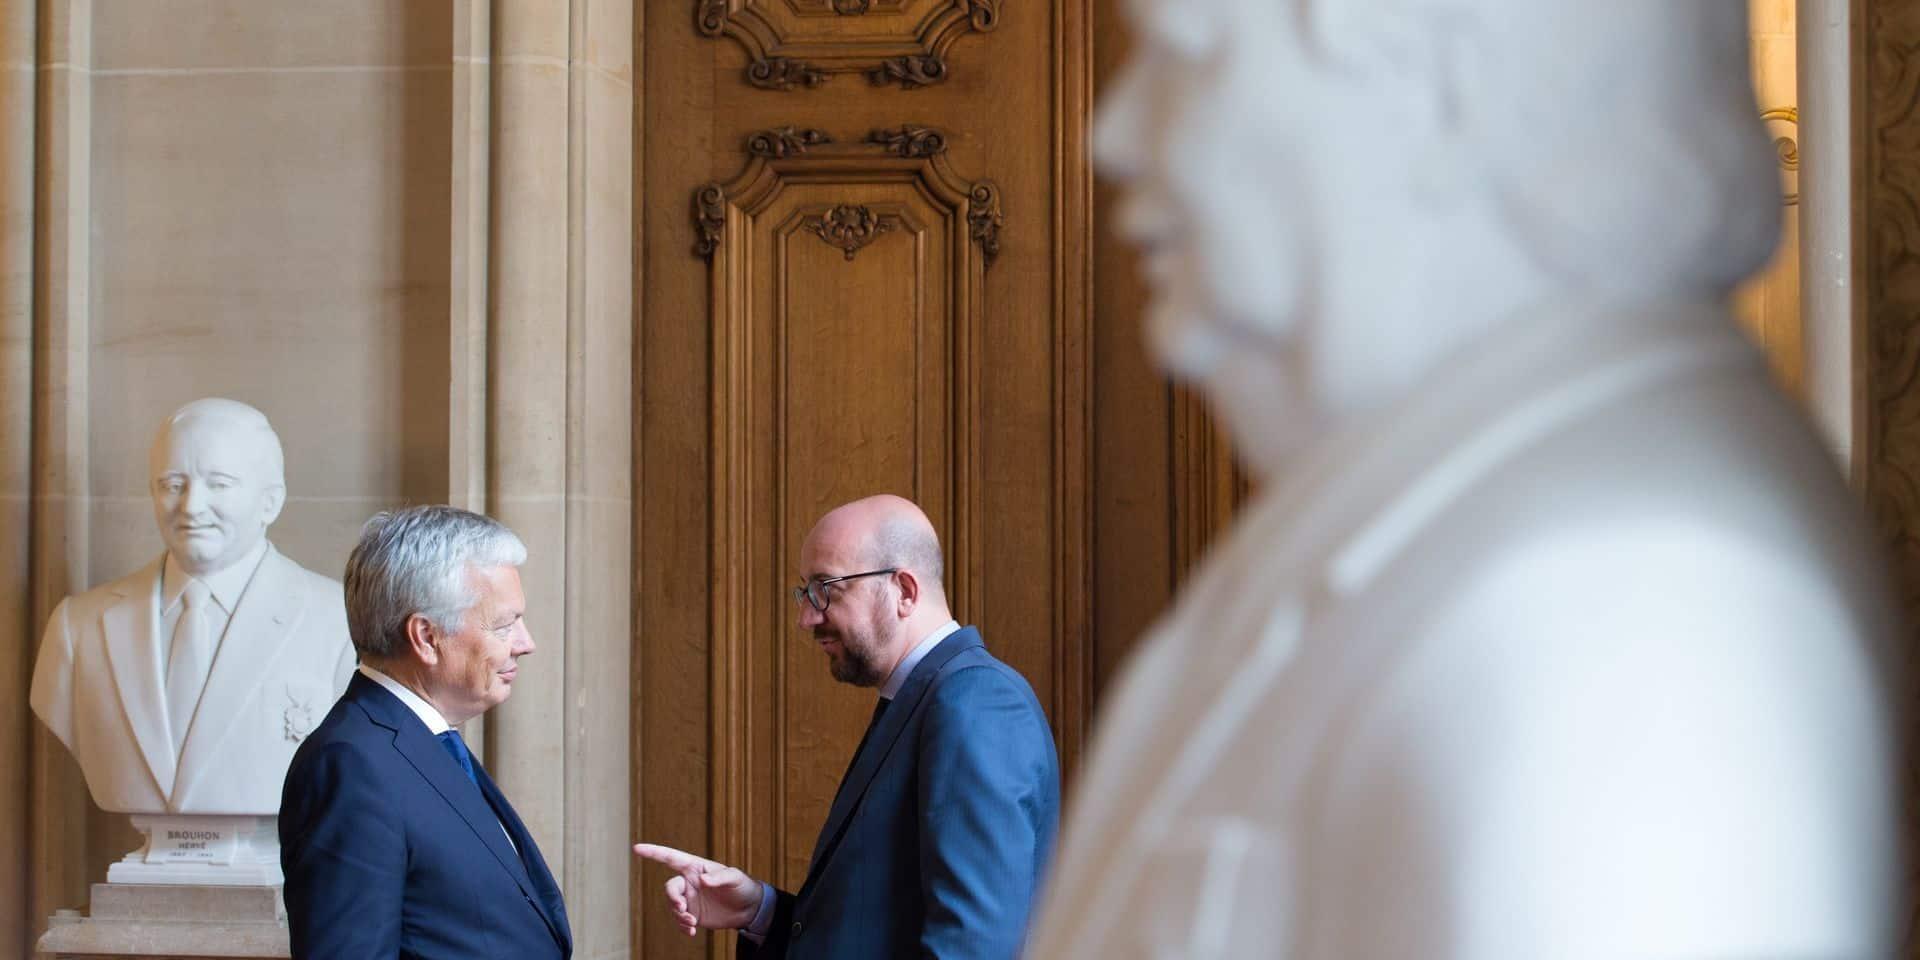 Édito: Didier Reynders commissaire européen belge? The right man